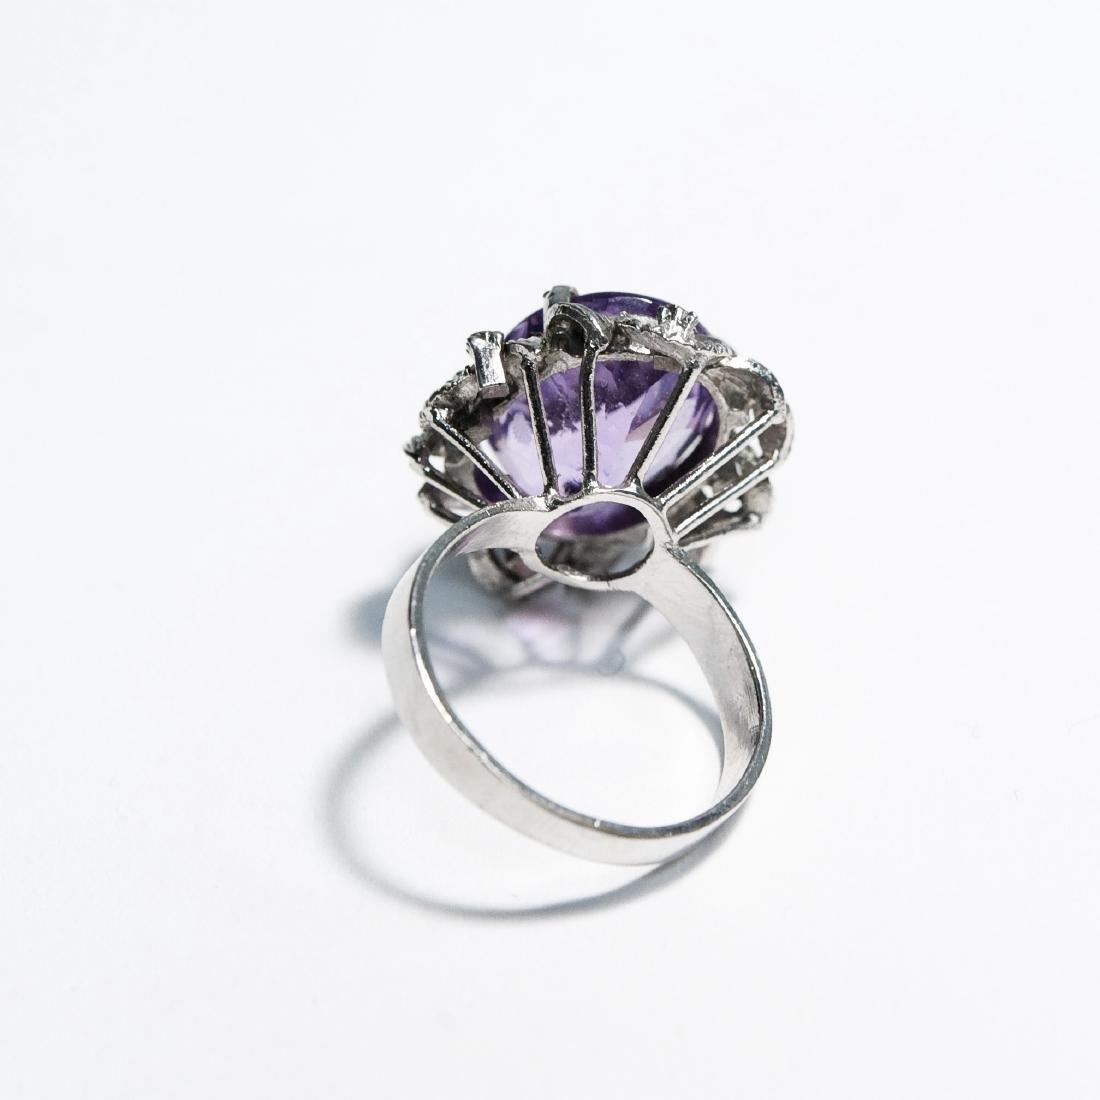 14K White Gold & Amethyst Ring. - 5